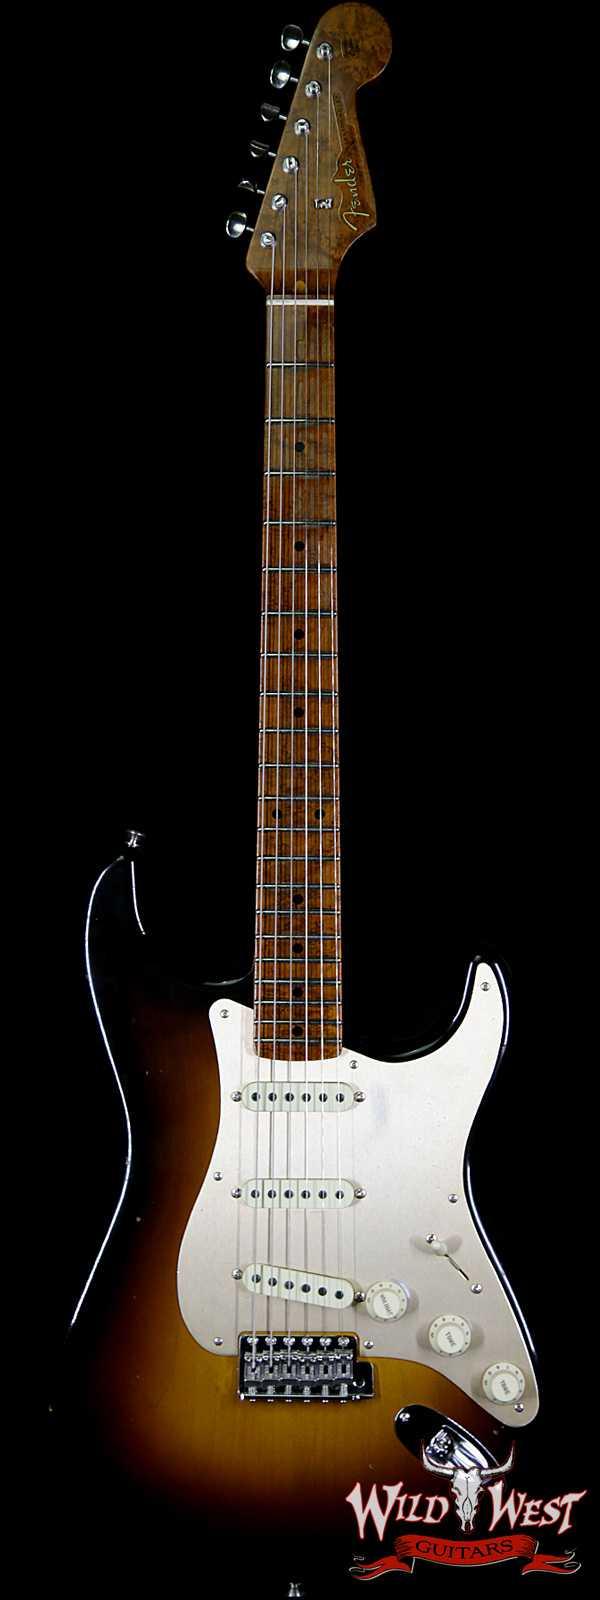 Fender Custom Shop 1956 Stratocaster Relic Roasted Birdeye Maple Neck 2 Tone Sunburst